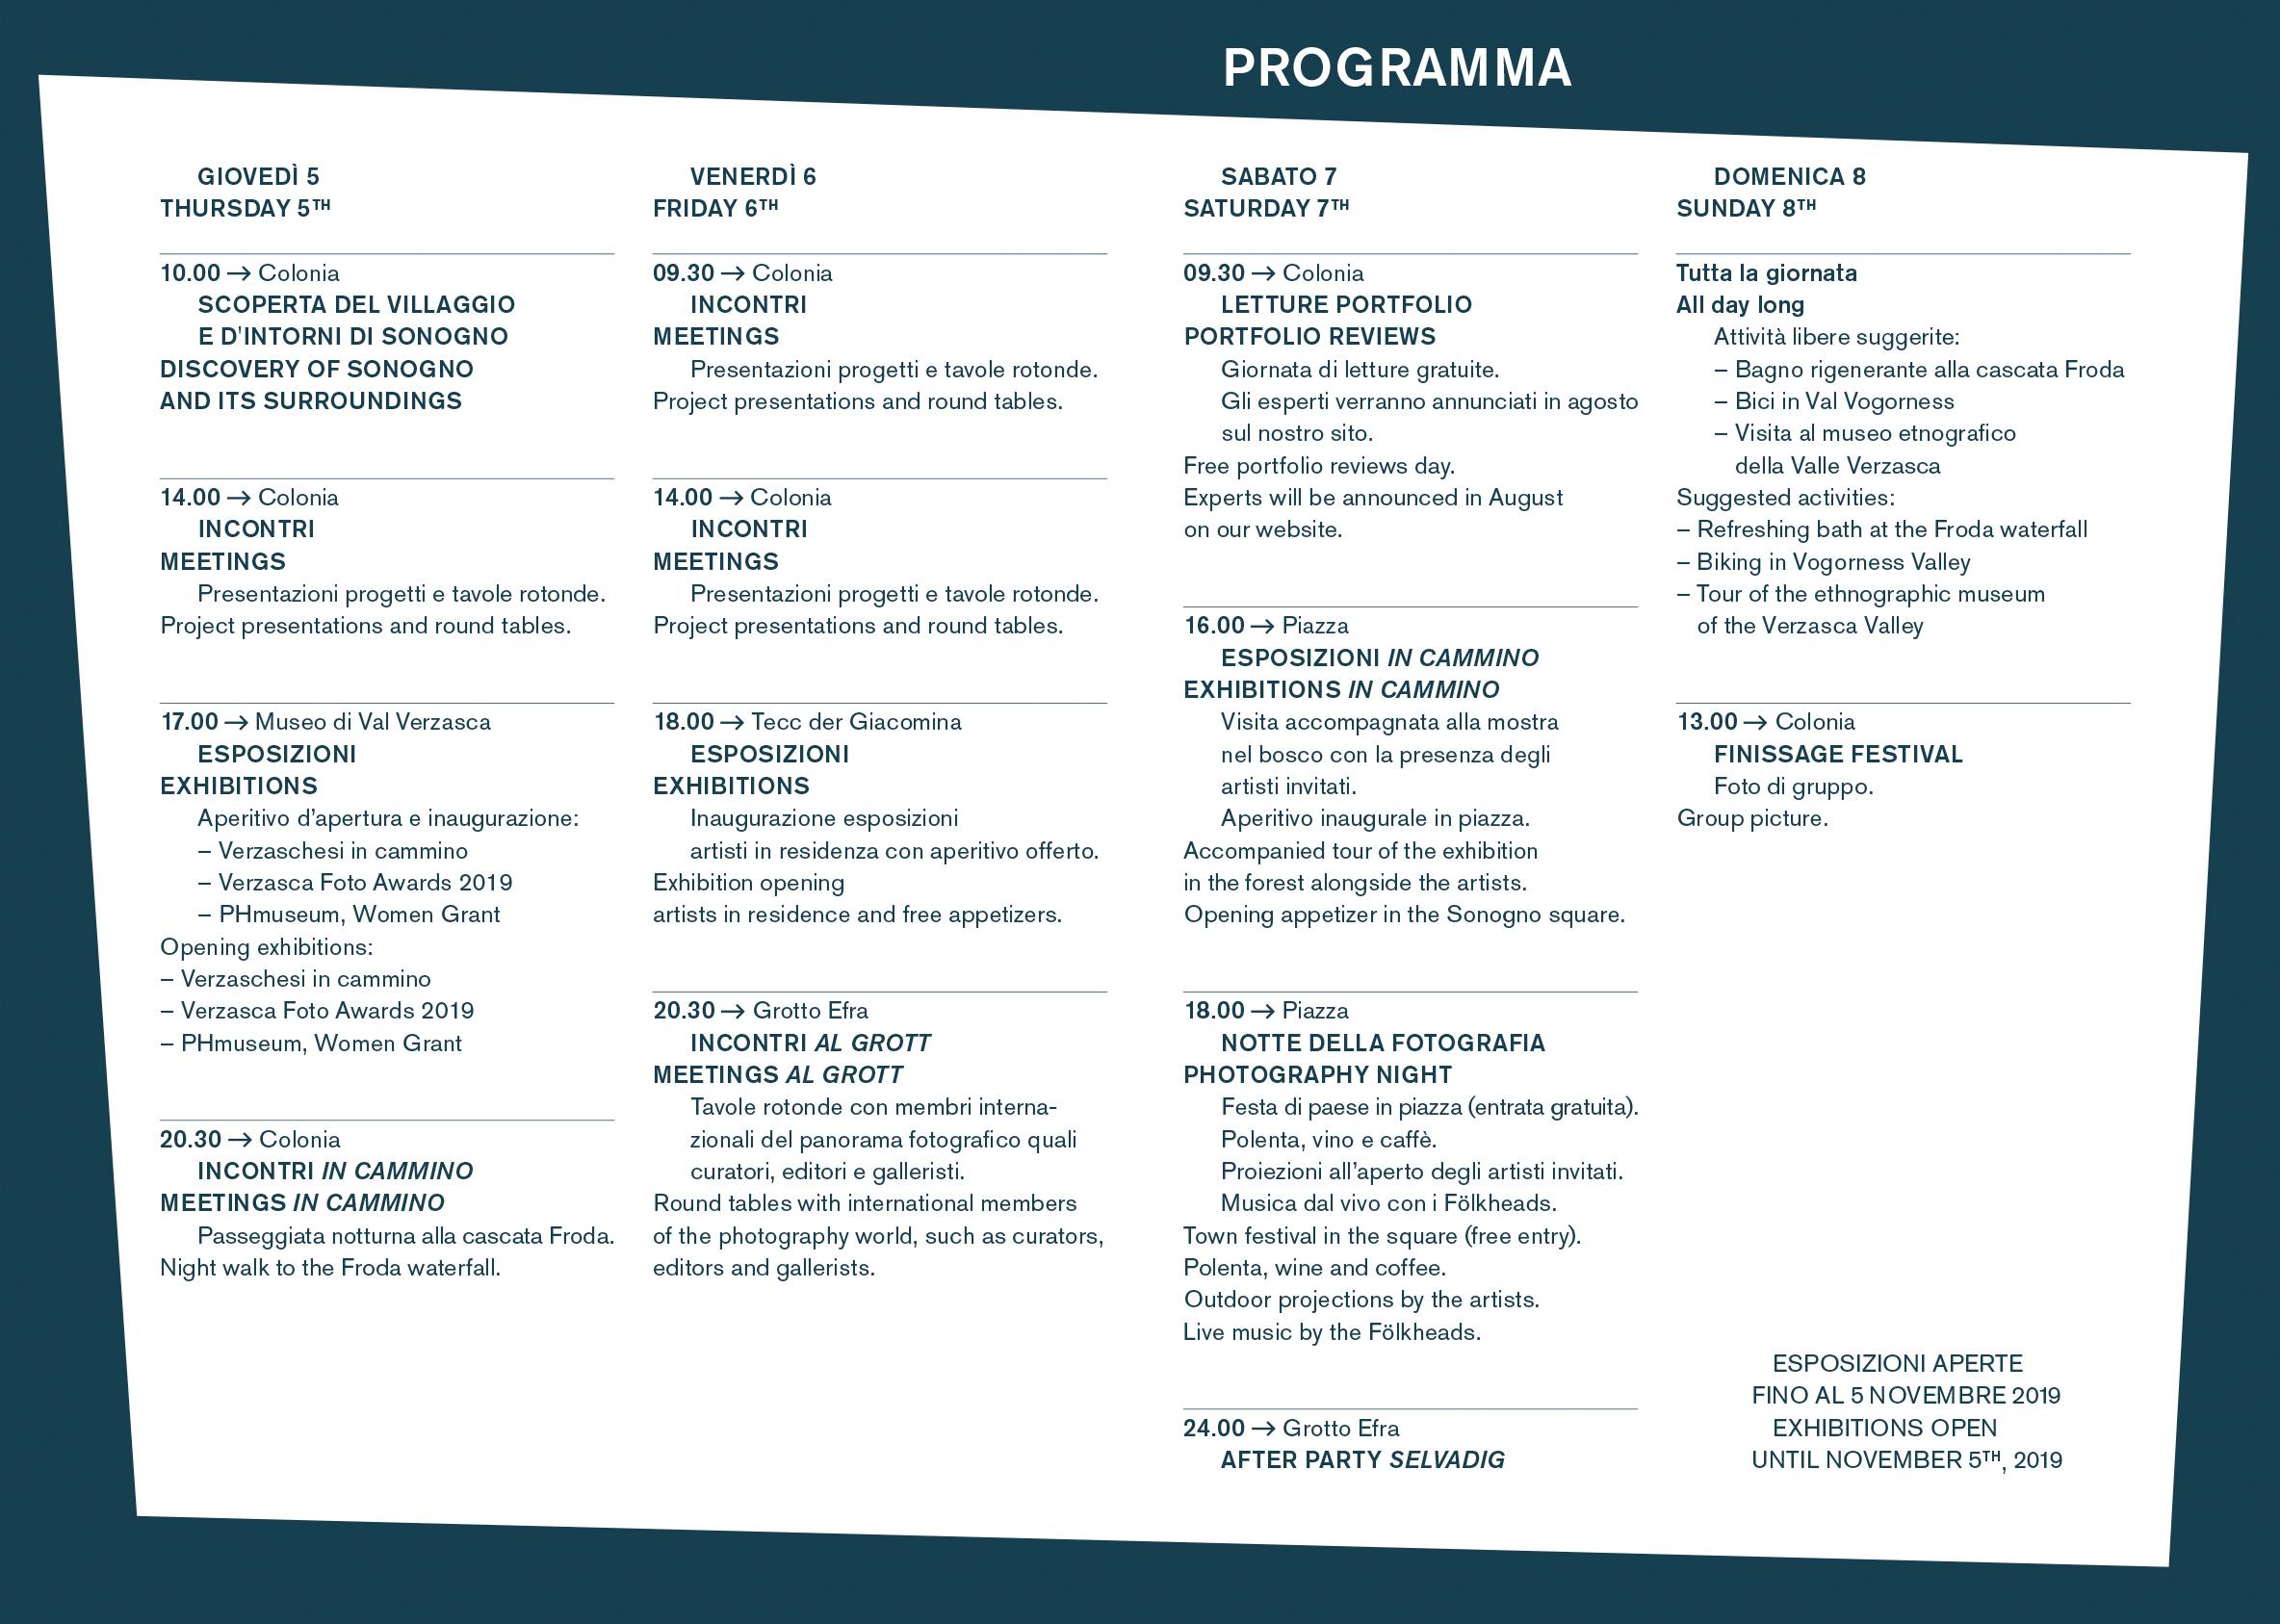 VFF-programma 2019.jpg